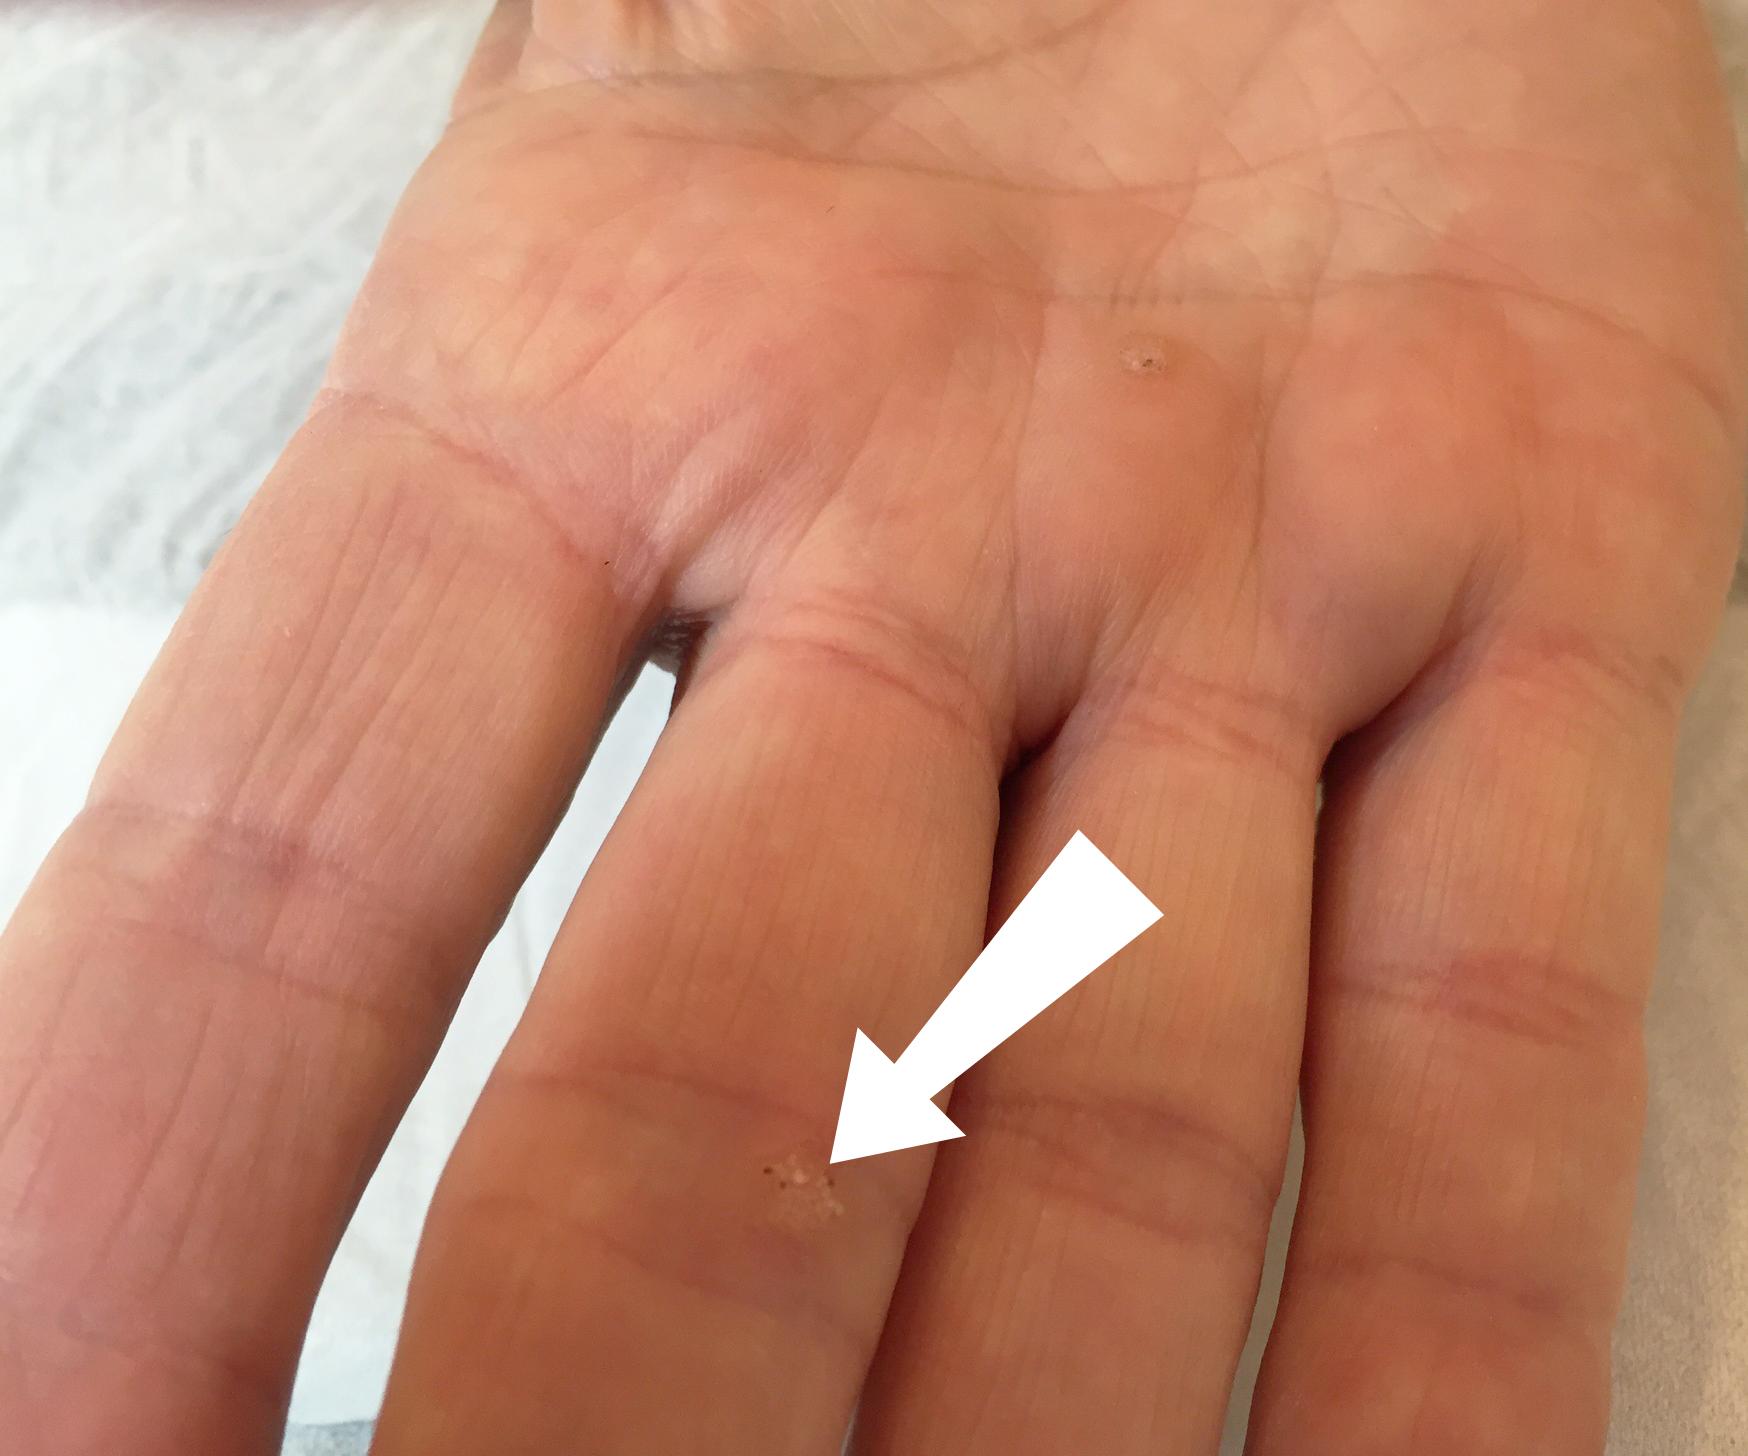 Warts on skin during pregnancy. Detoxifiere efecte secundare